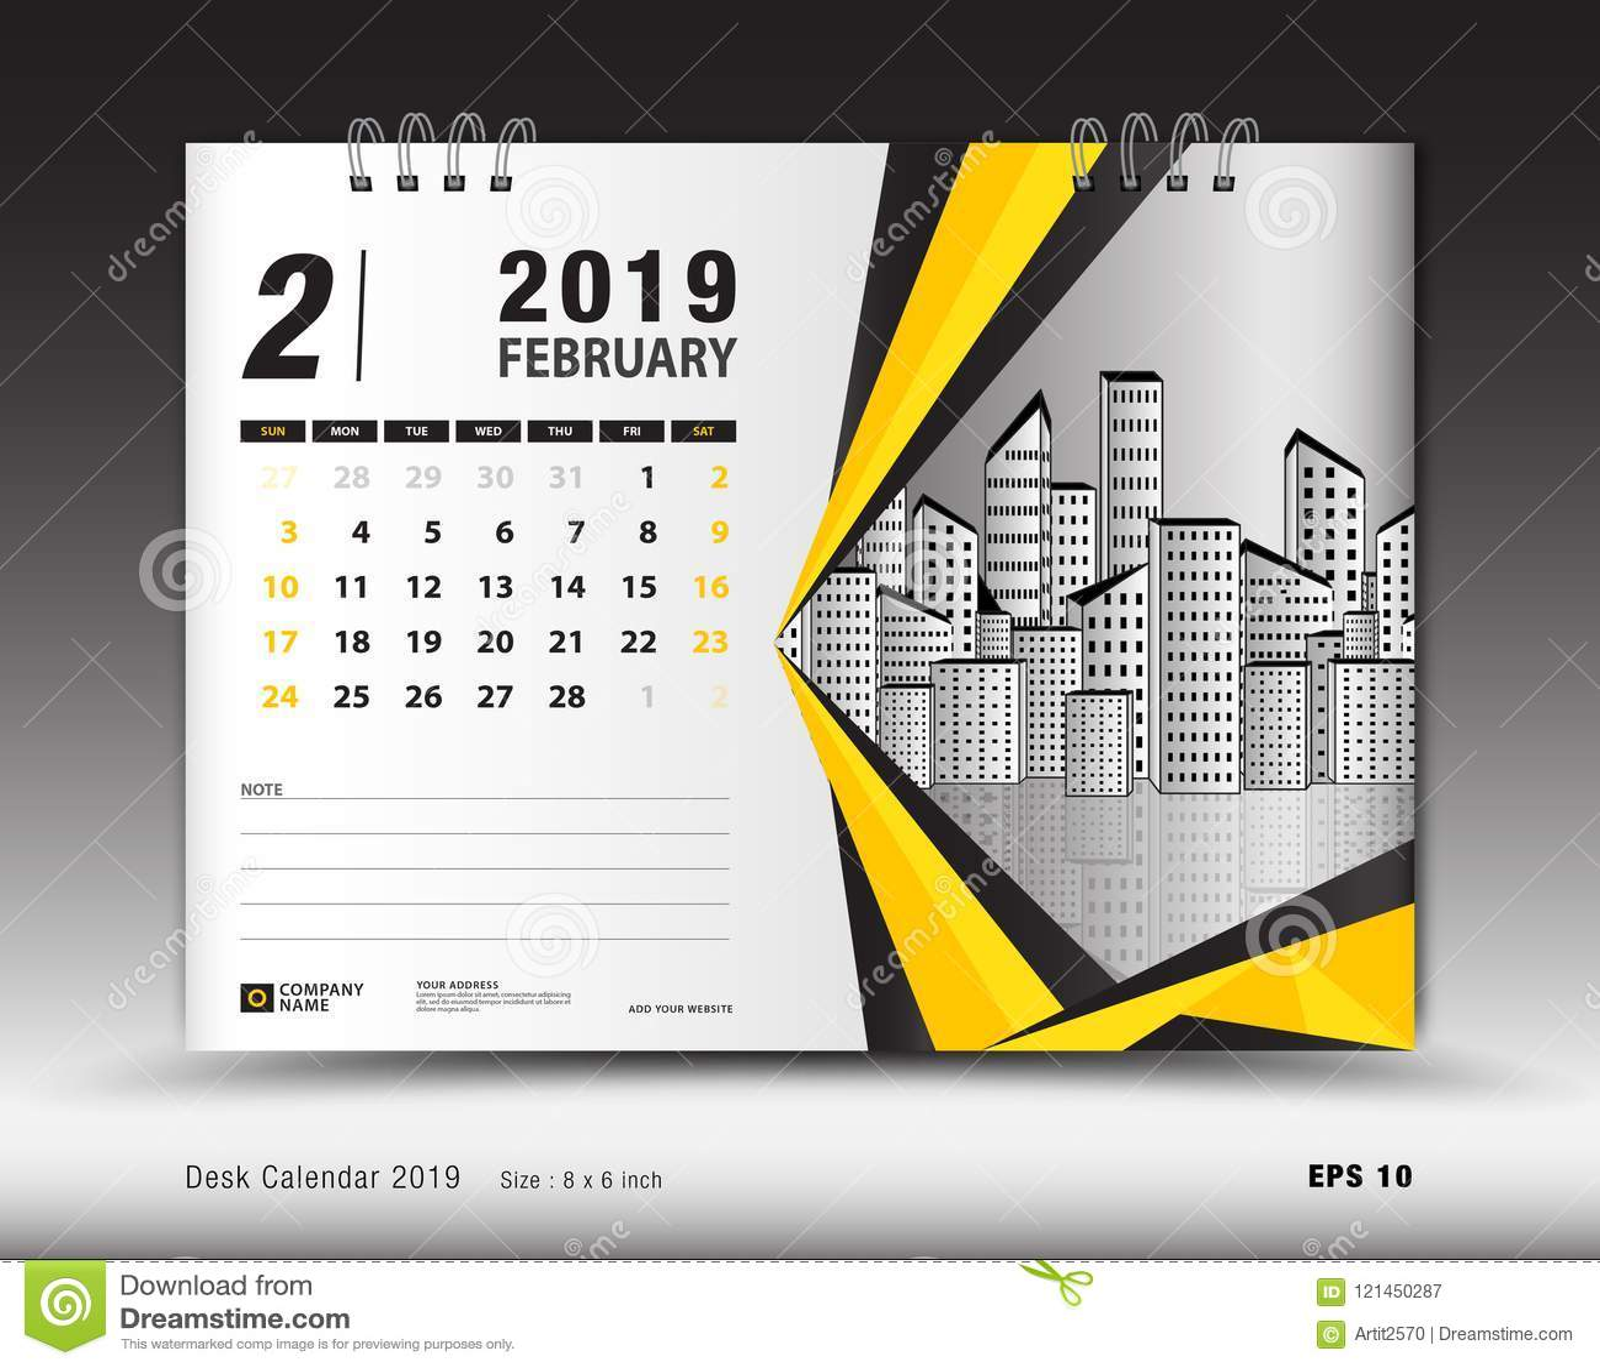 Desk Calendar For February 2019 Template Printable Calendar